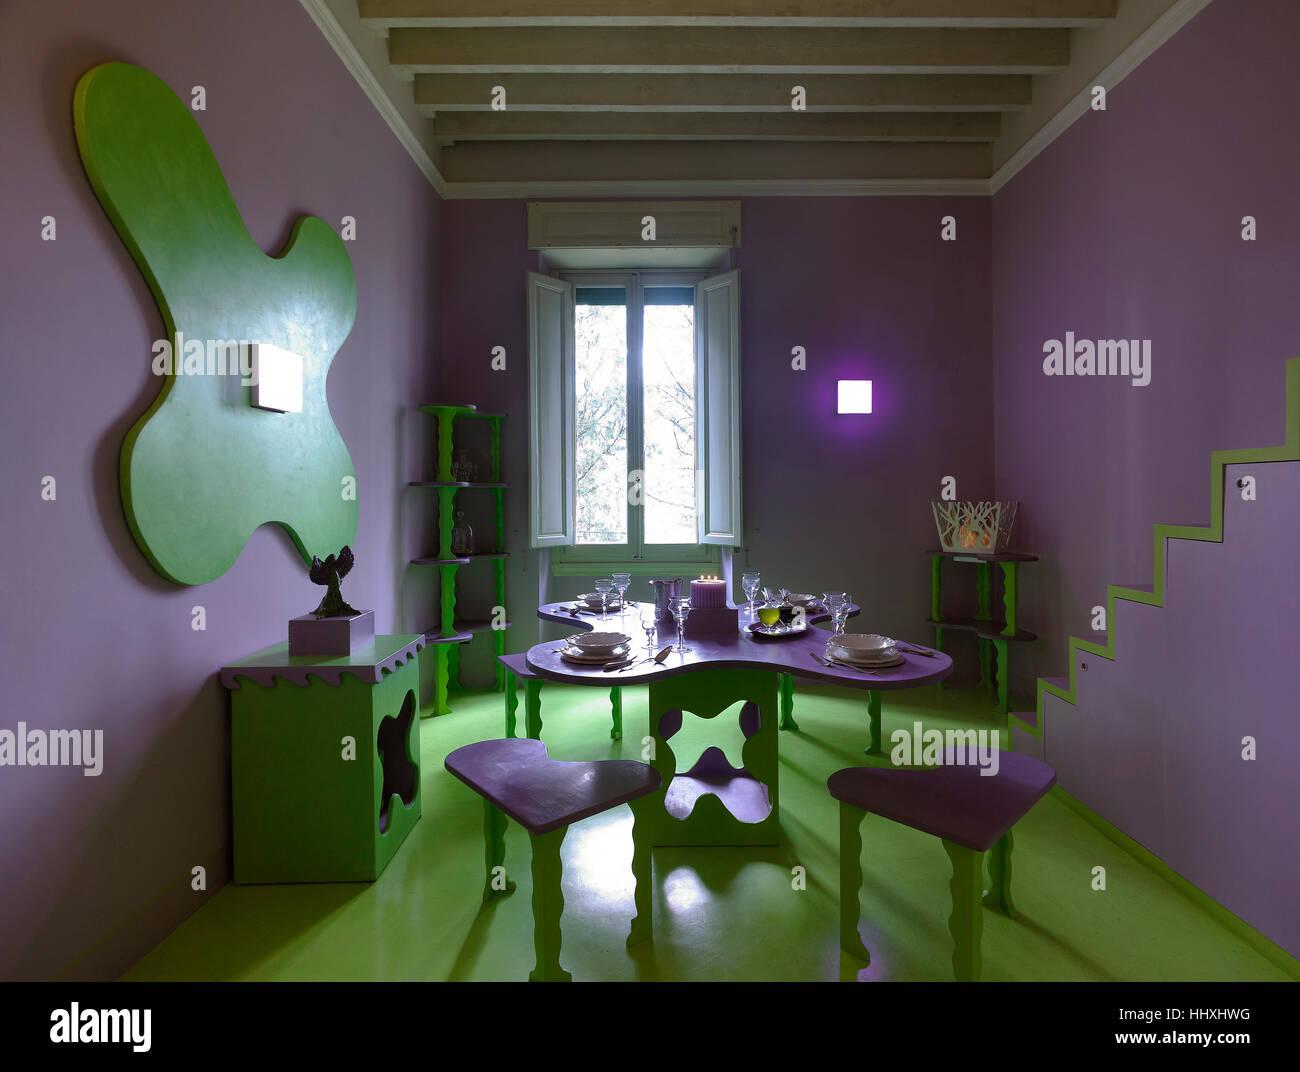 Unusual design: purple in the interior